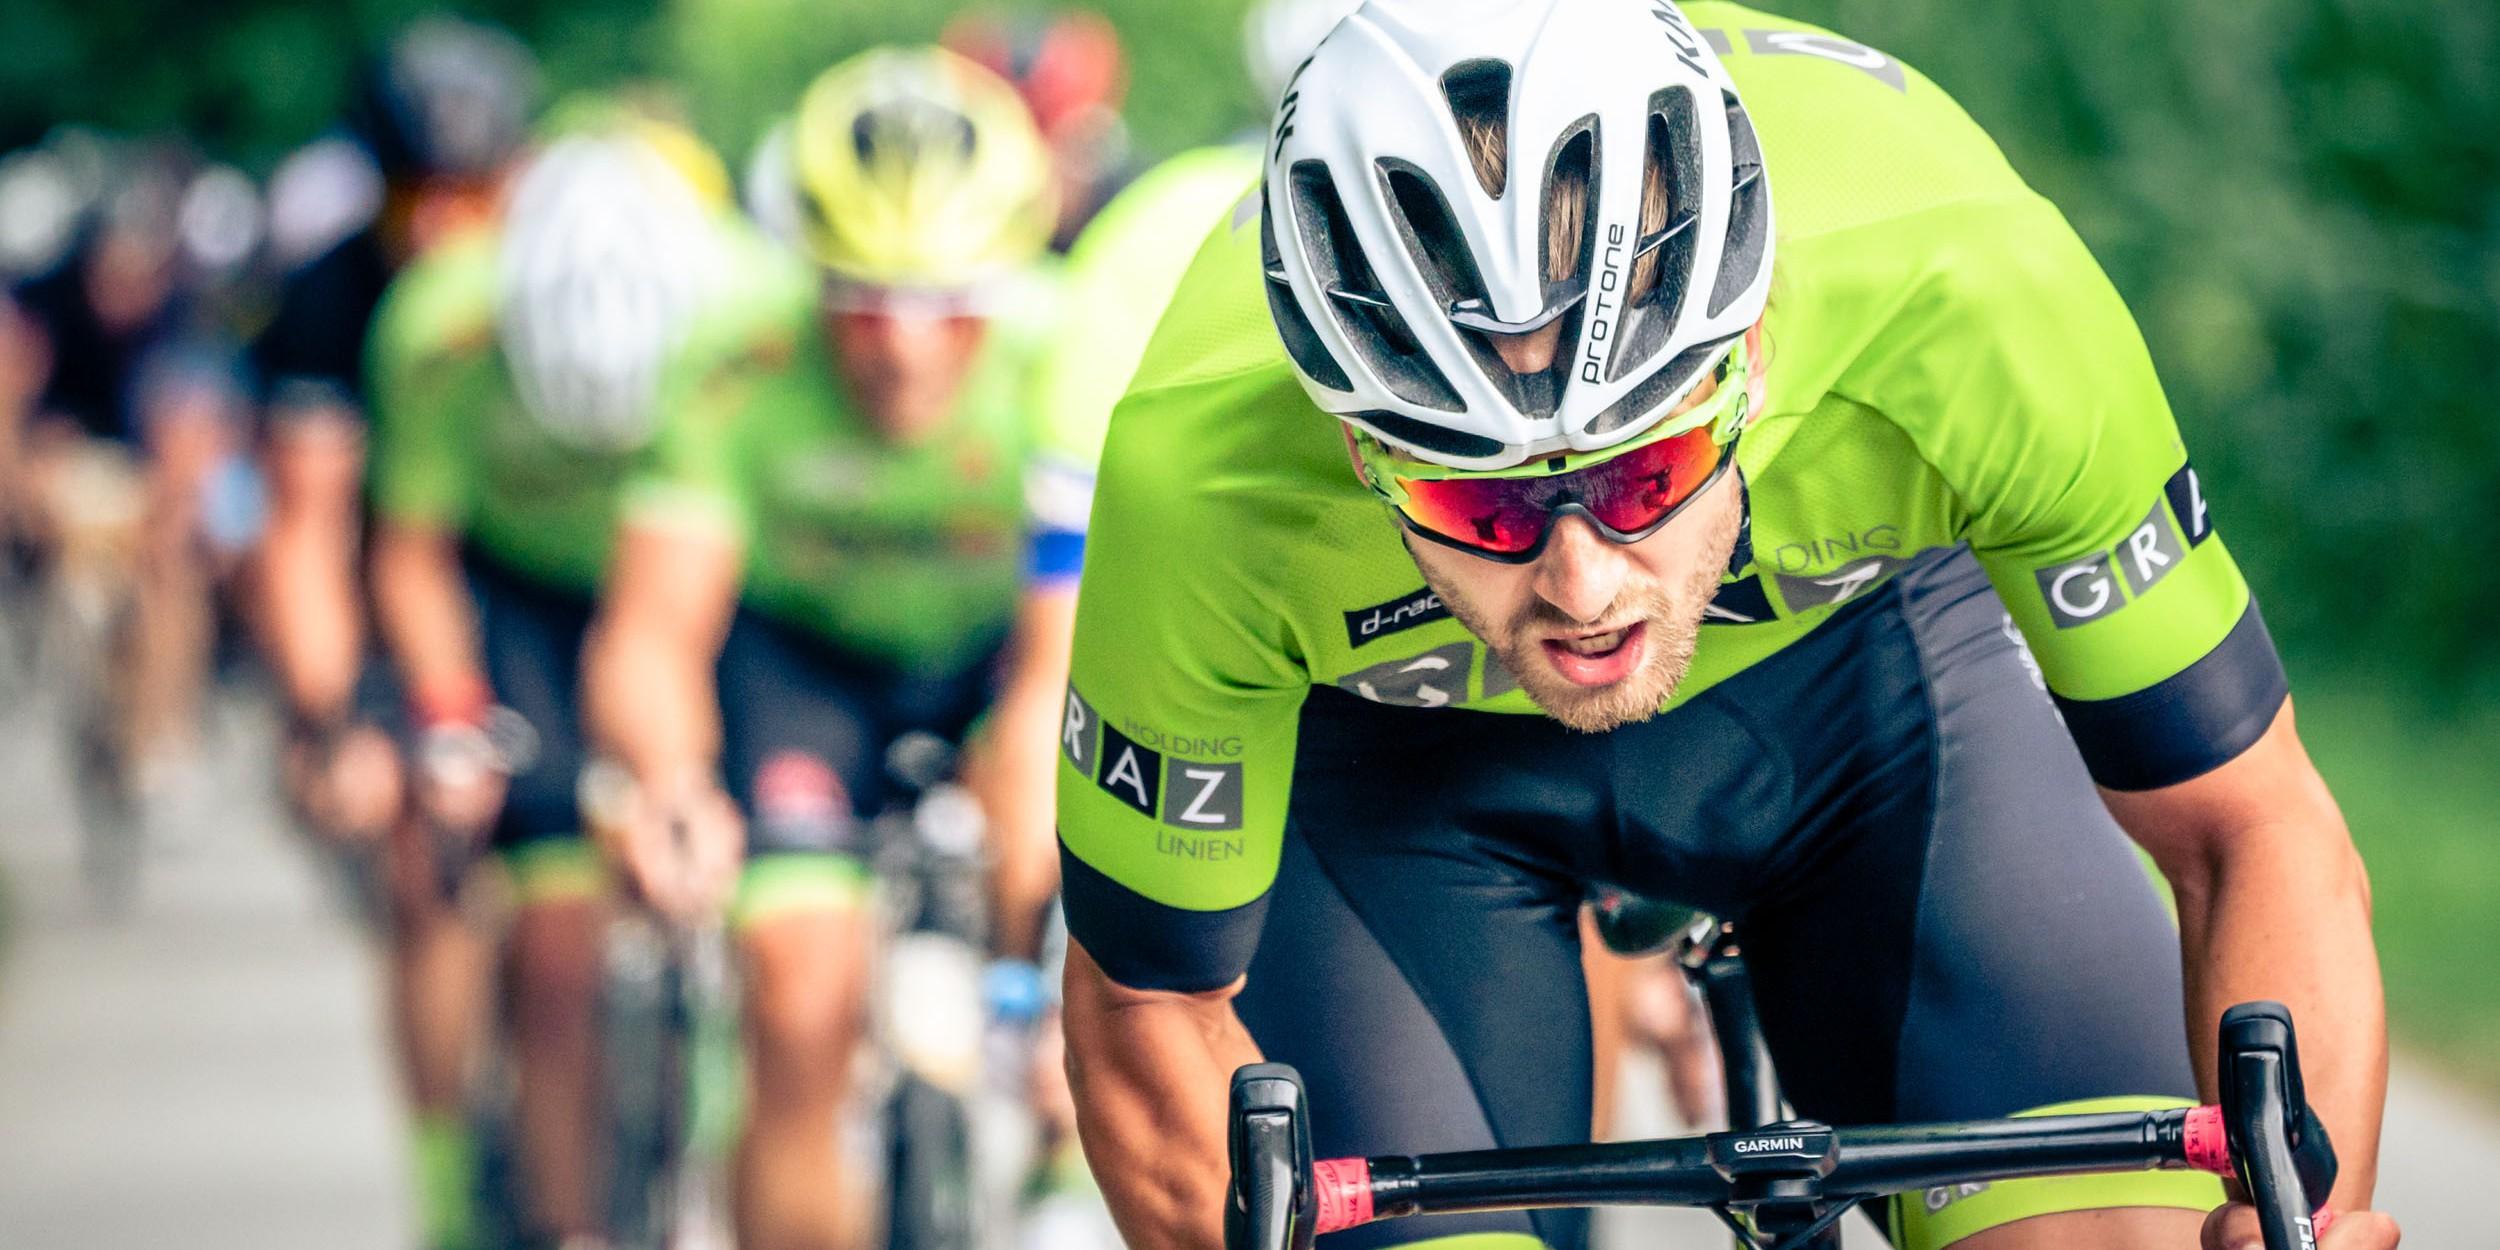 Österr. Meister bei Ultra Rad Challenge gekürt